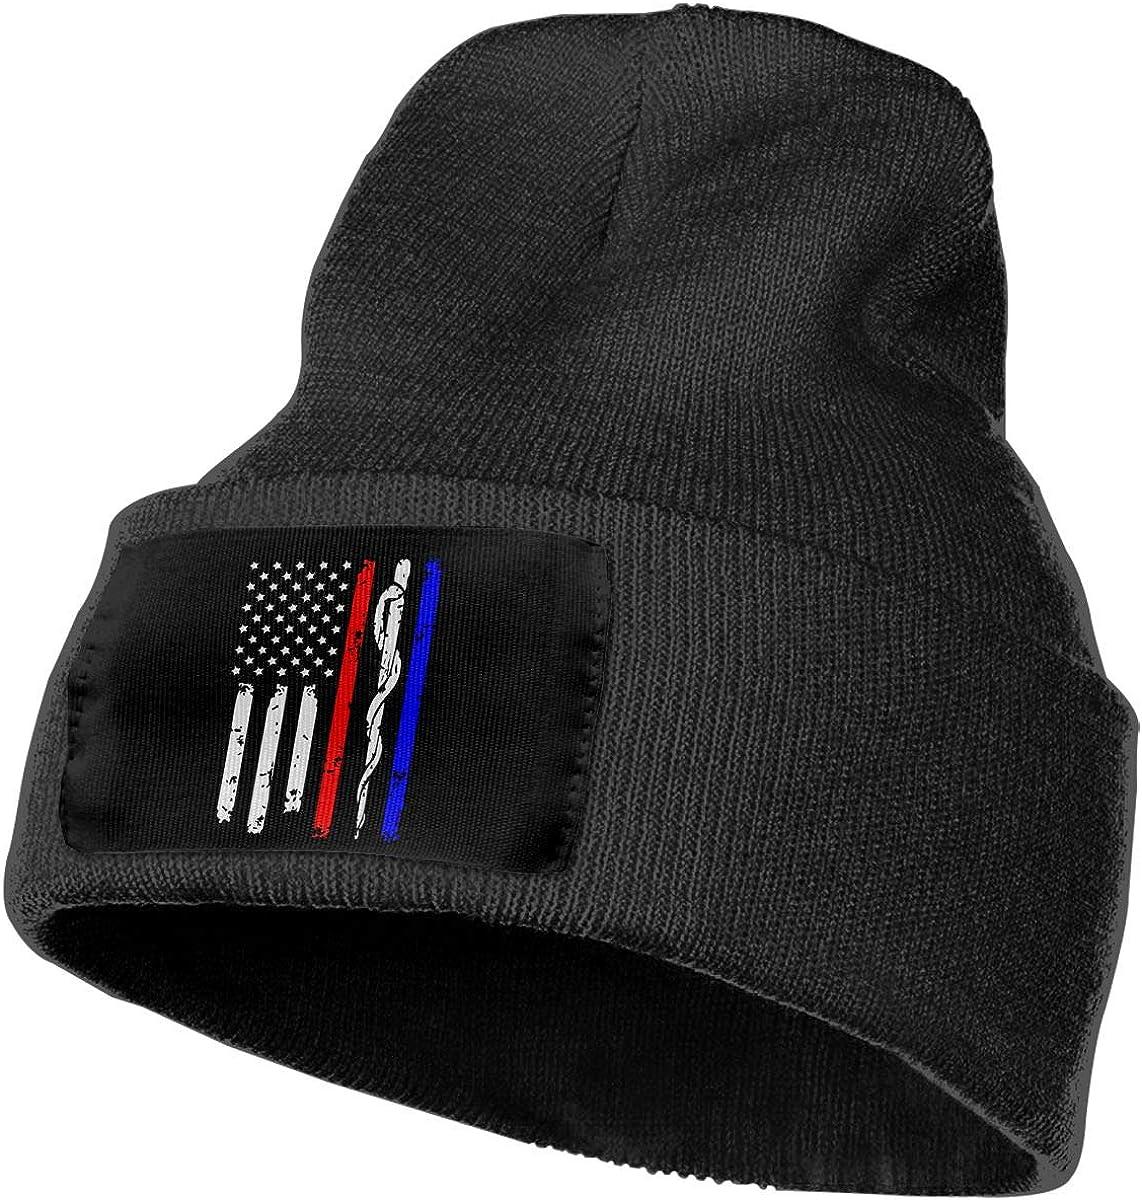 COLLJL-8 Men /& Women Police /& Firefighter /& EMT Flag Outdoor Warm Knit Beanies Hat Soft Winter Skull Caps